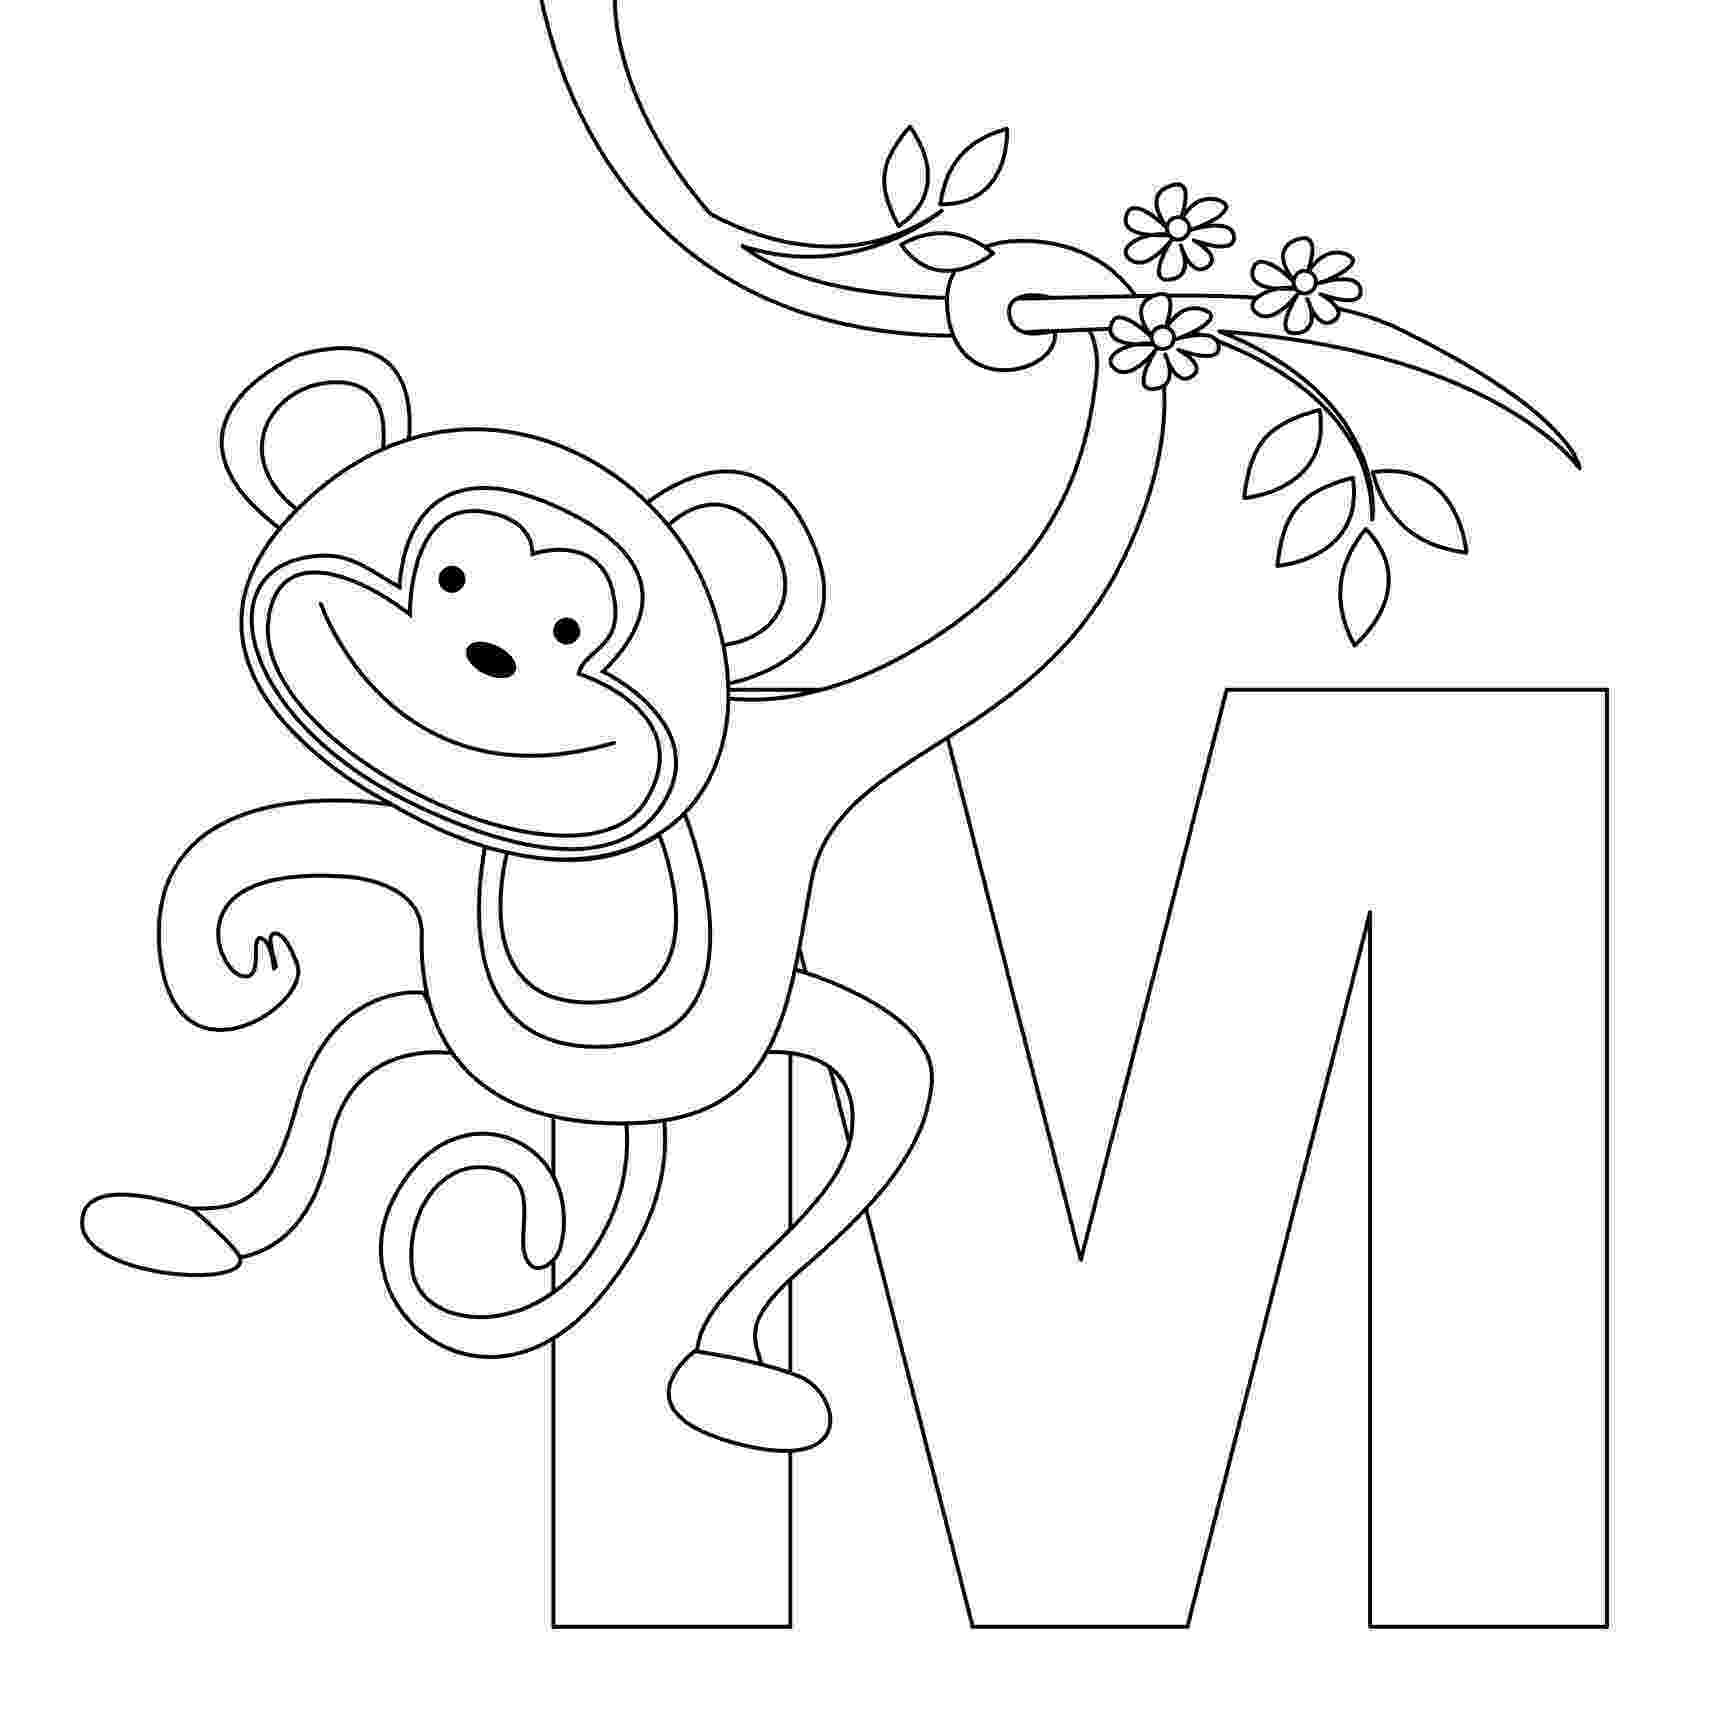 abc coloring book printable free printable abc coloring pages for kids coloring abc book printable